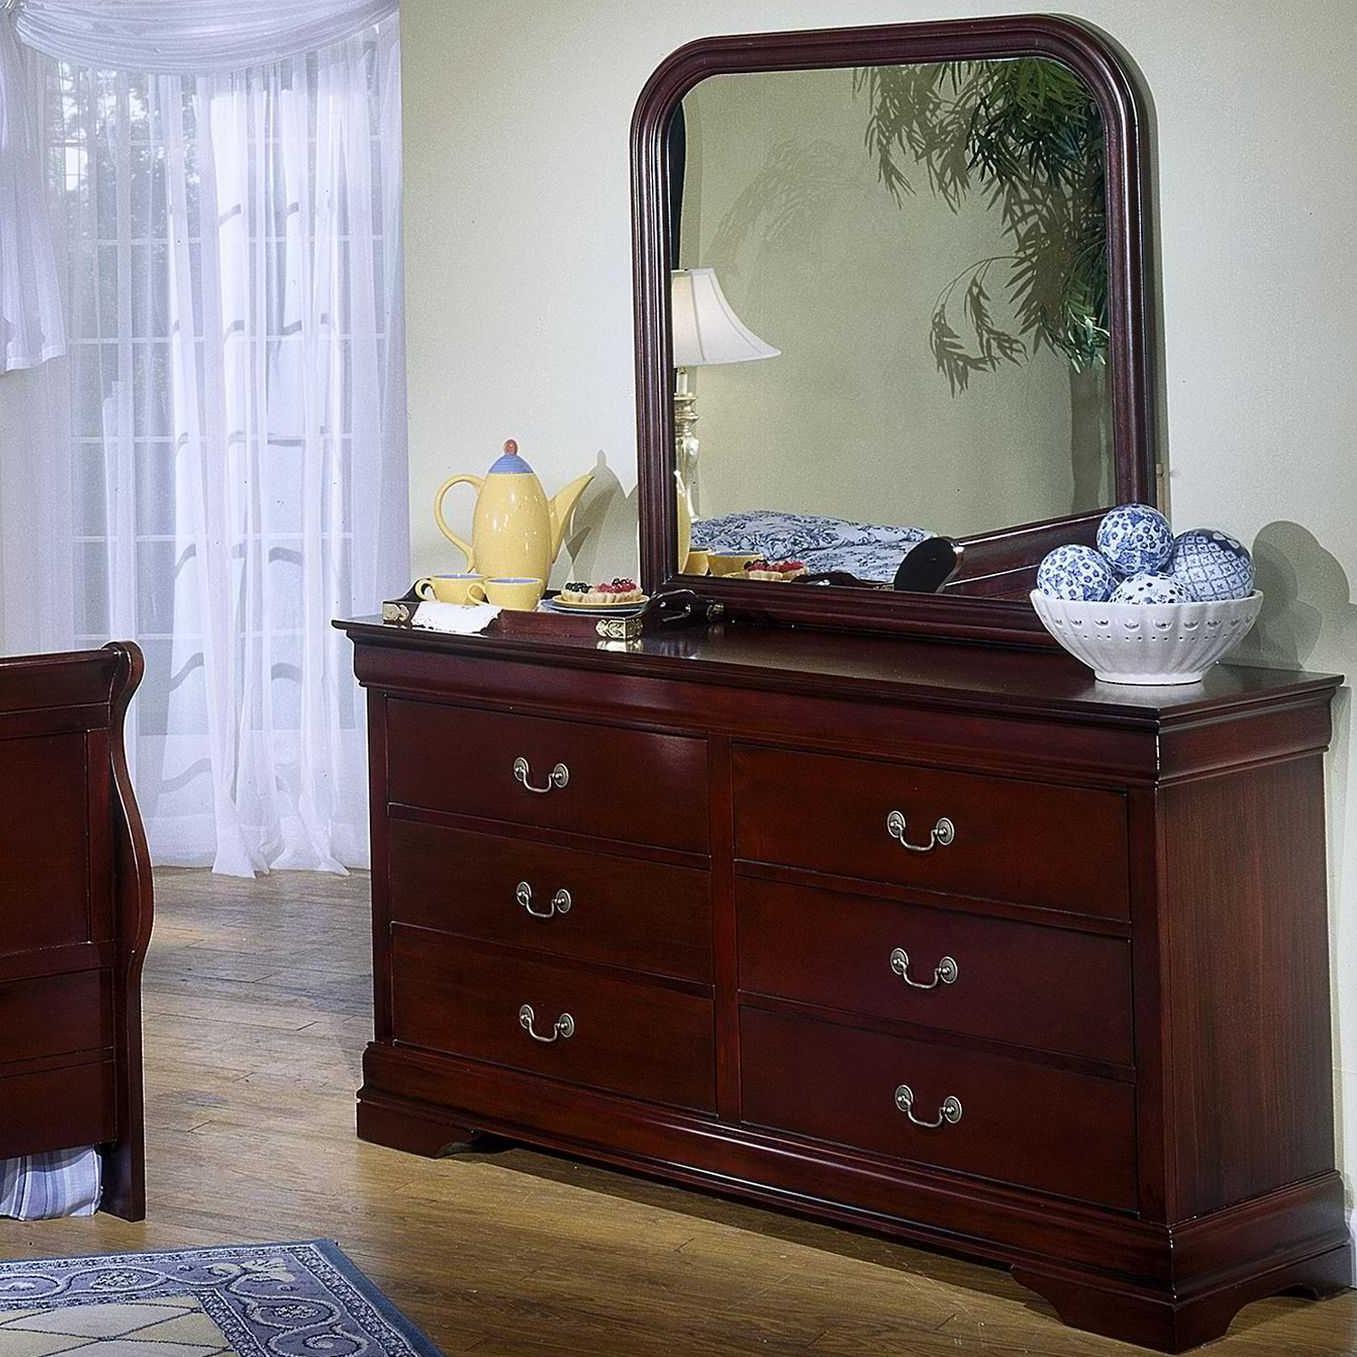 Lifestyle 5933 Dresser & Mirror Combo - Item Number: C5933K-040-6DCH+050-MHCH